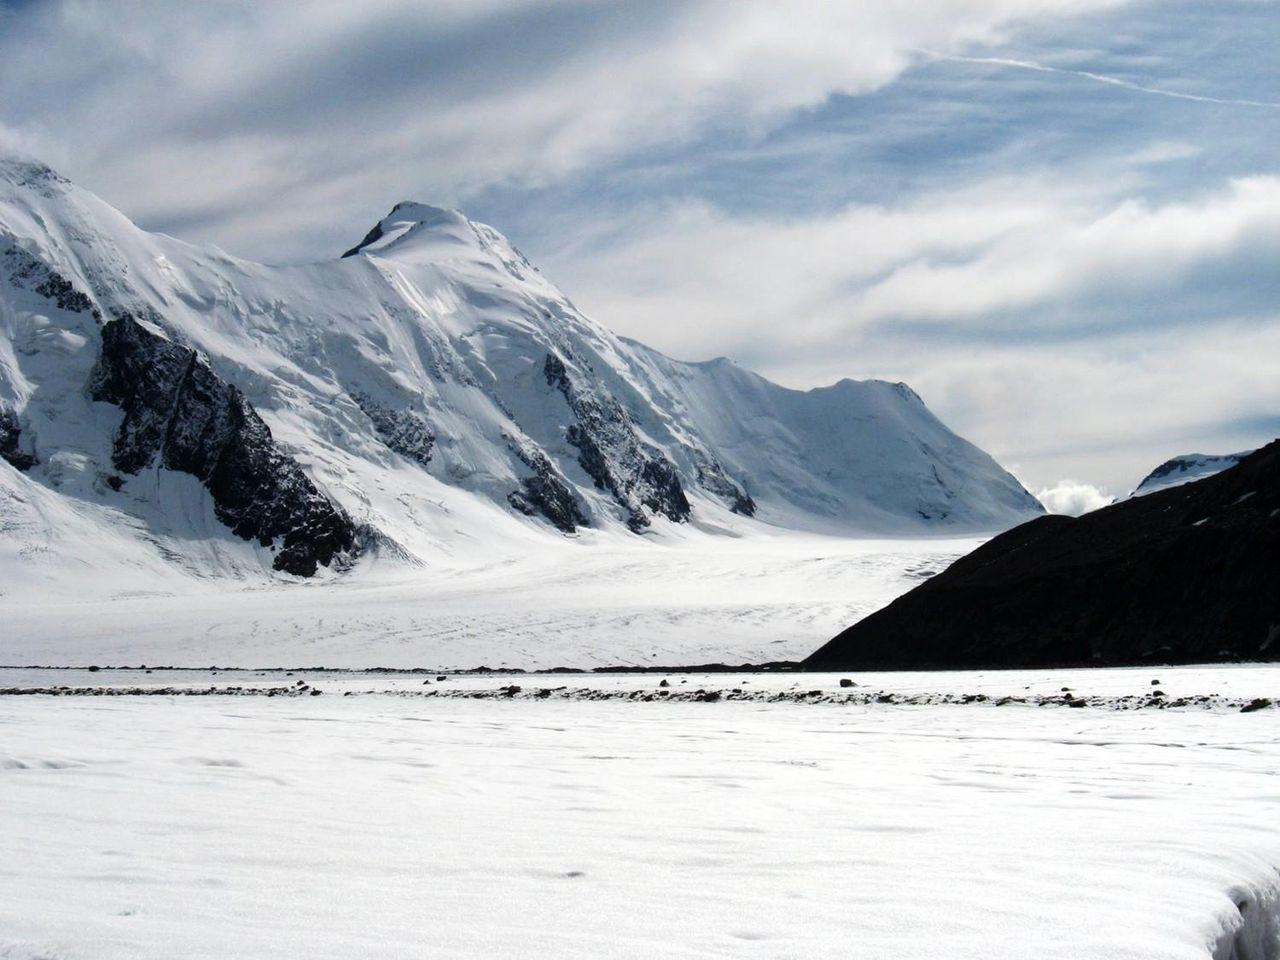 Daerah paling membekukan di Eurasia barat (Aletsch Glacier)